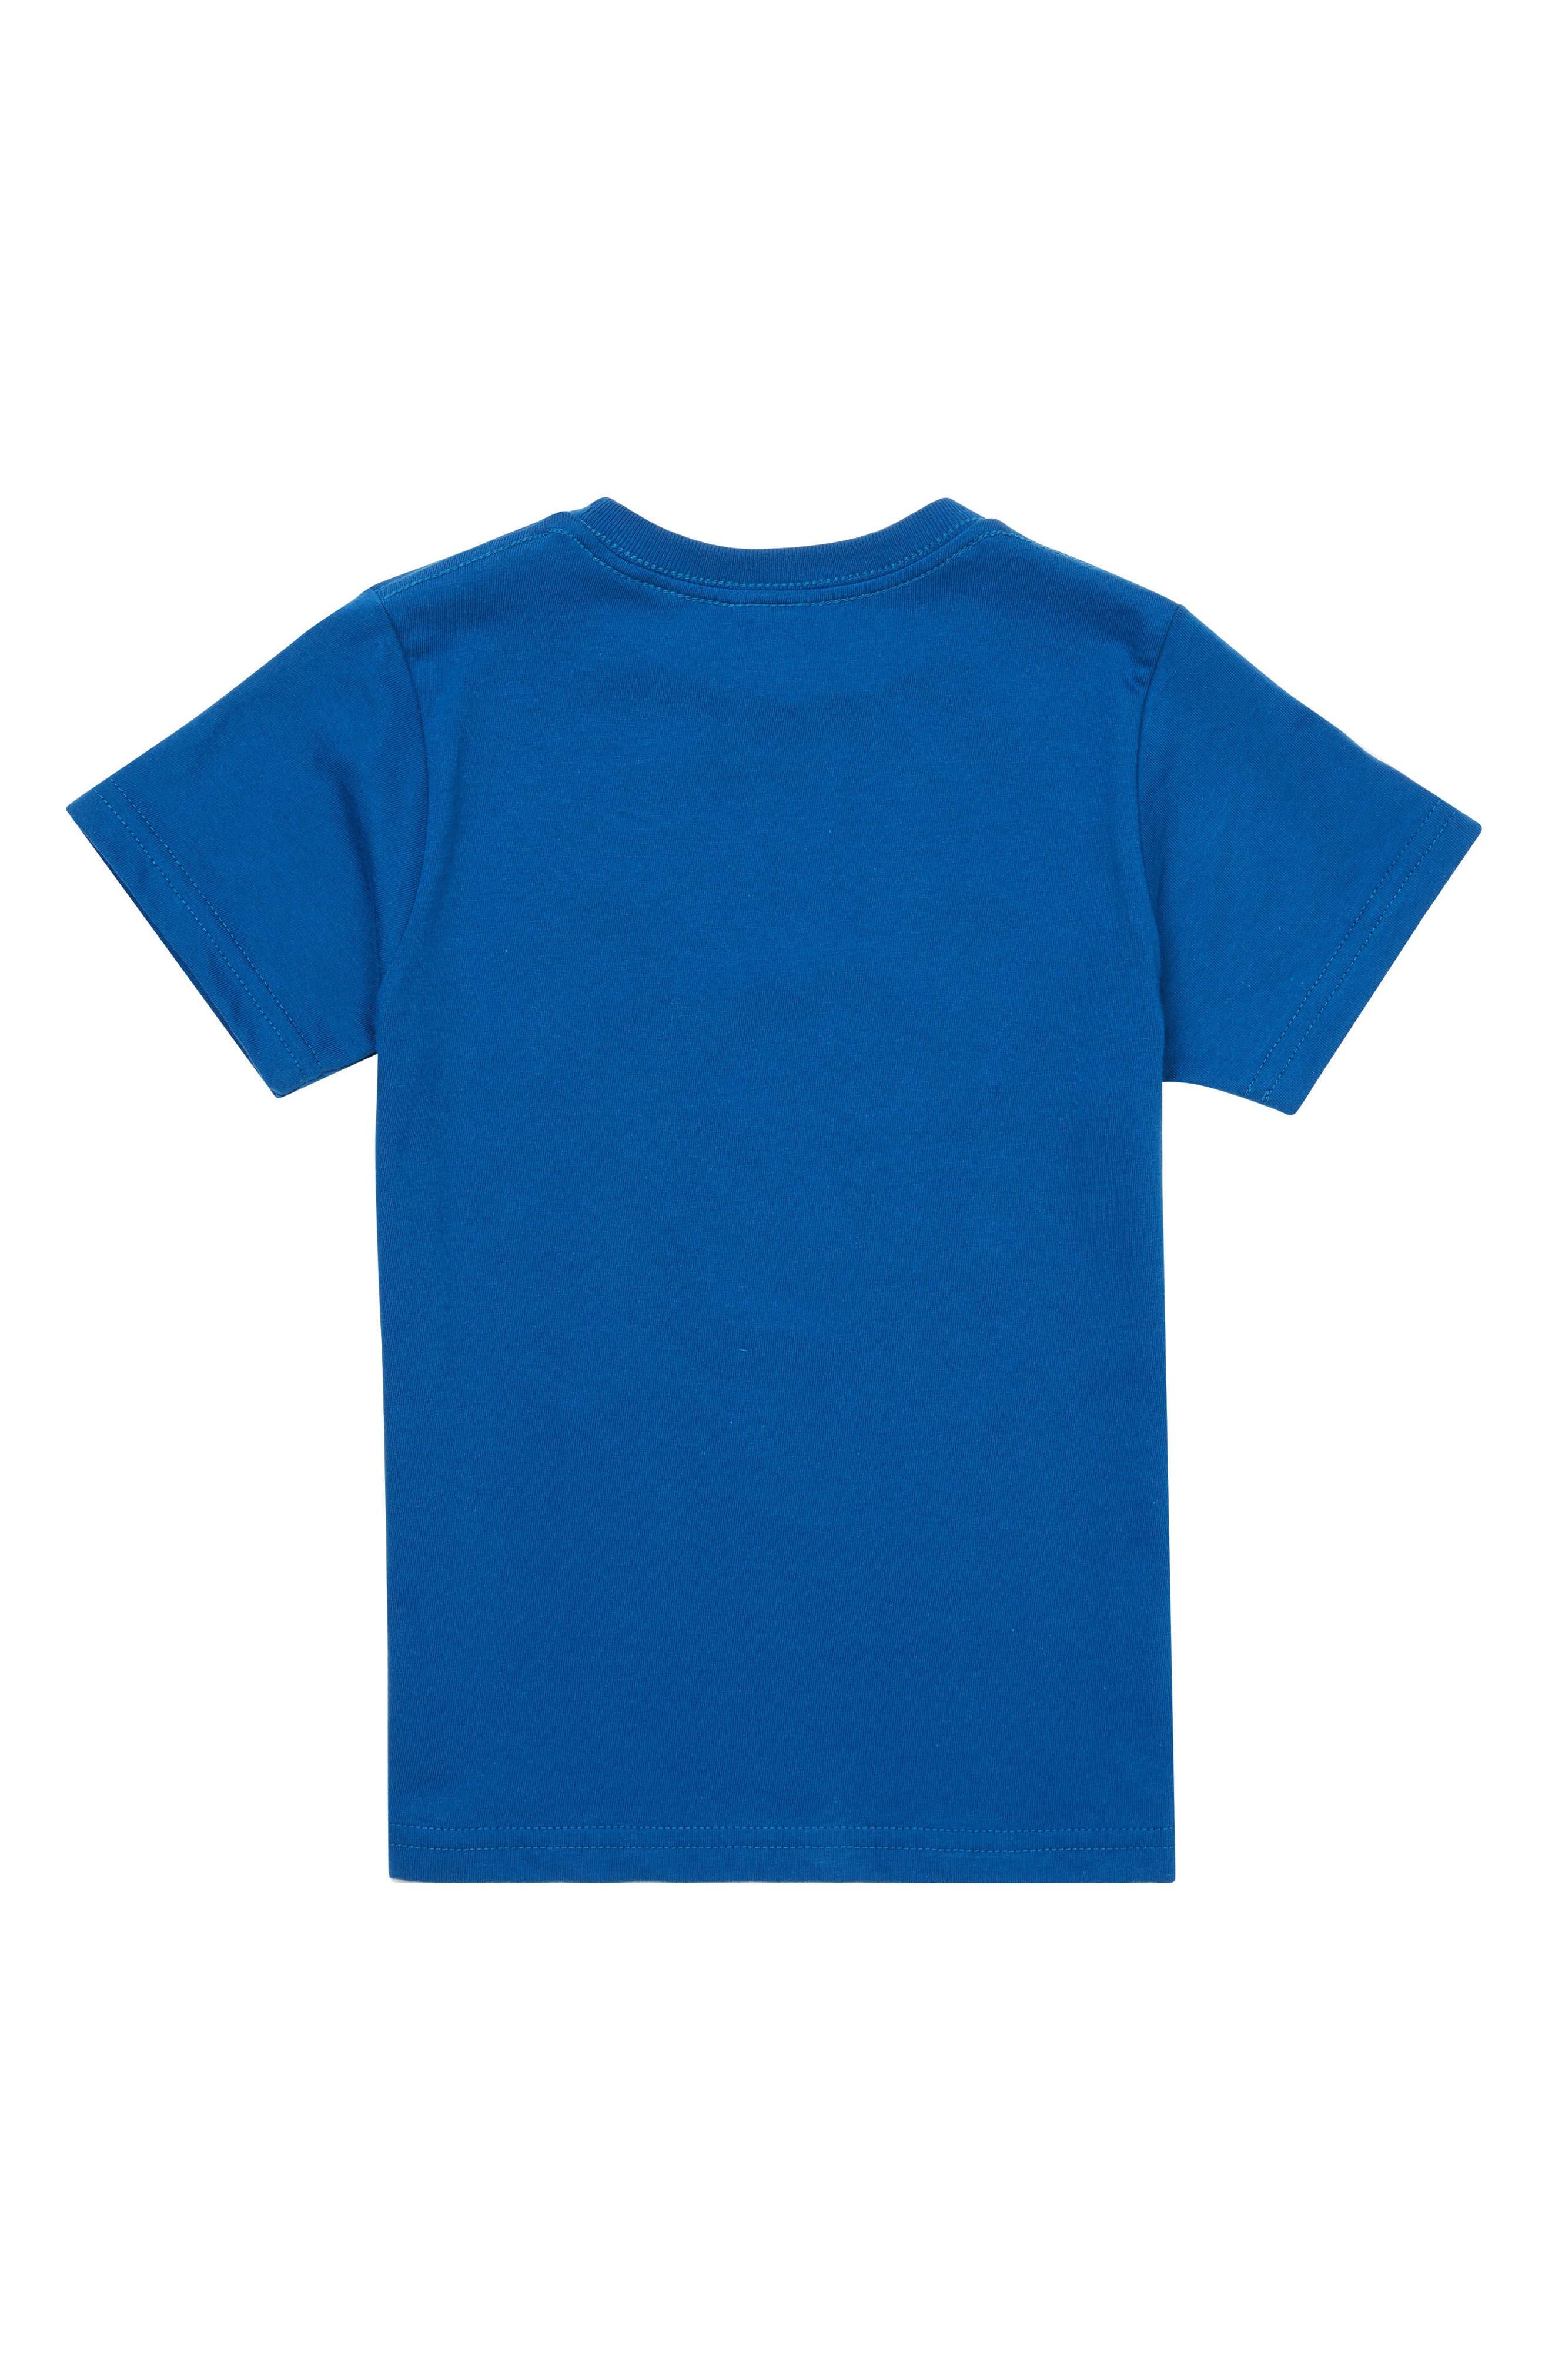 Digi Pool Graphic T-Shirt,                             Alternate thumbnail 2, color,                             Camper Blue